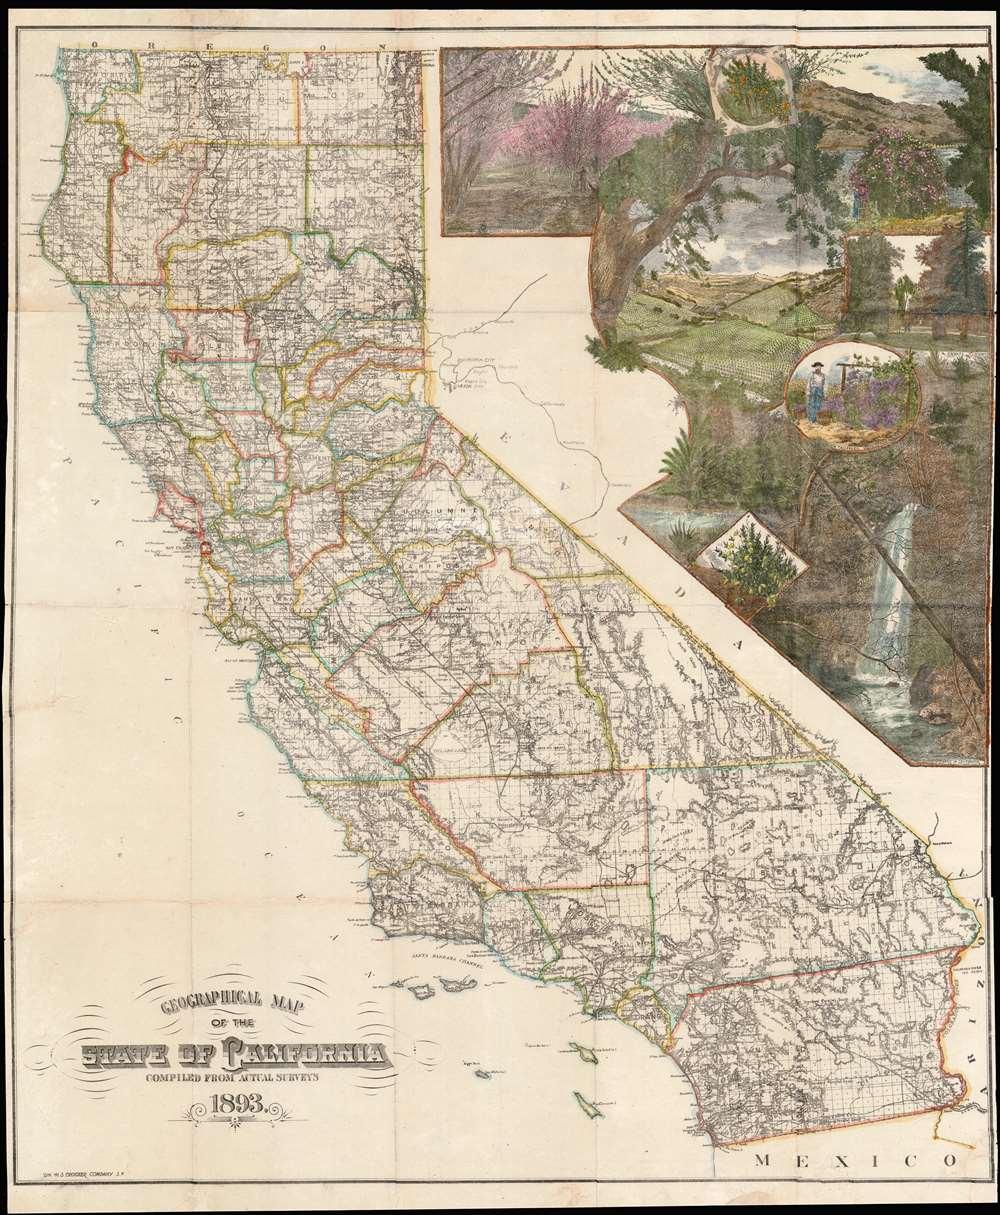 1893 H. S. Crocker Map of California w/ Wine Making Vignette